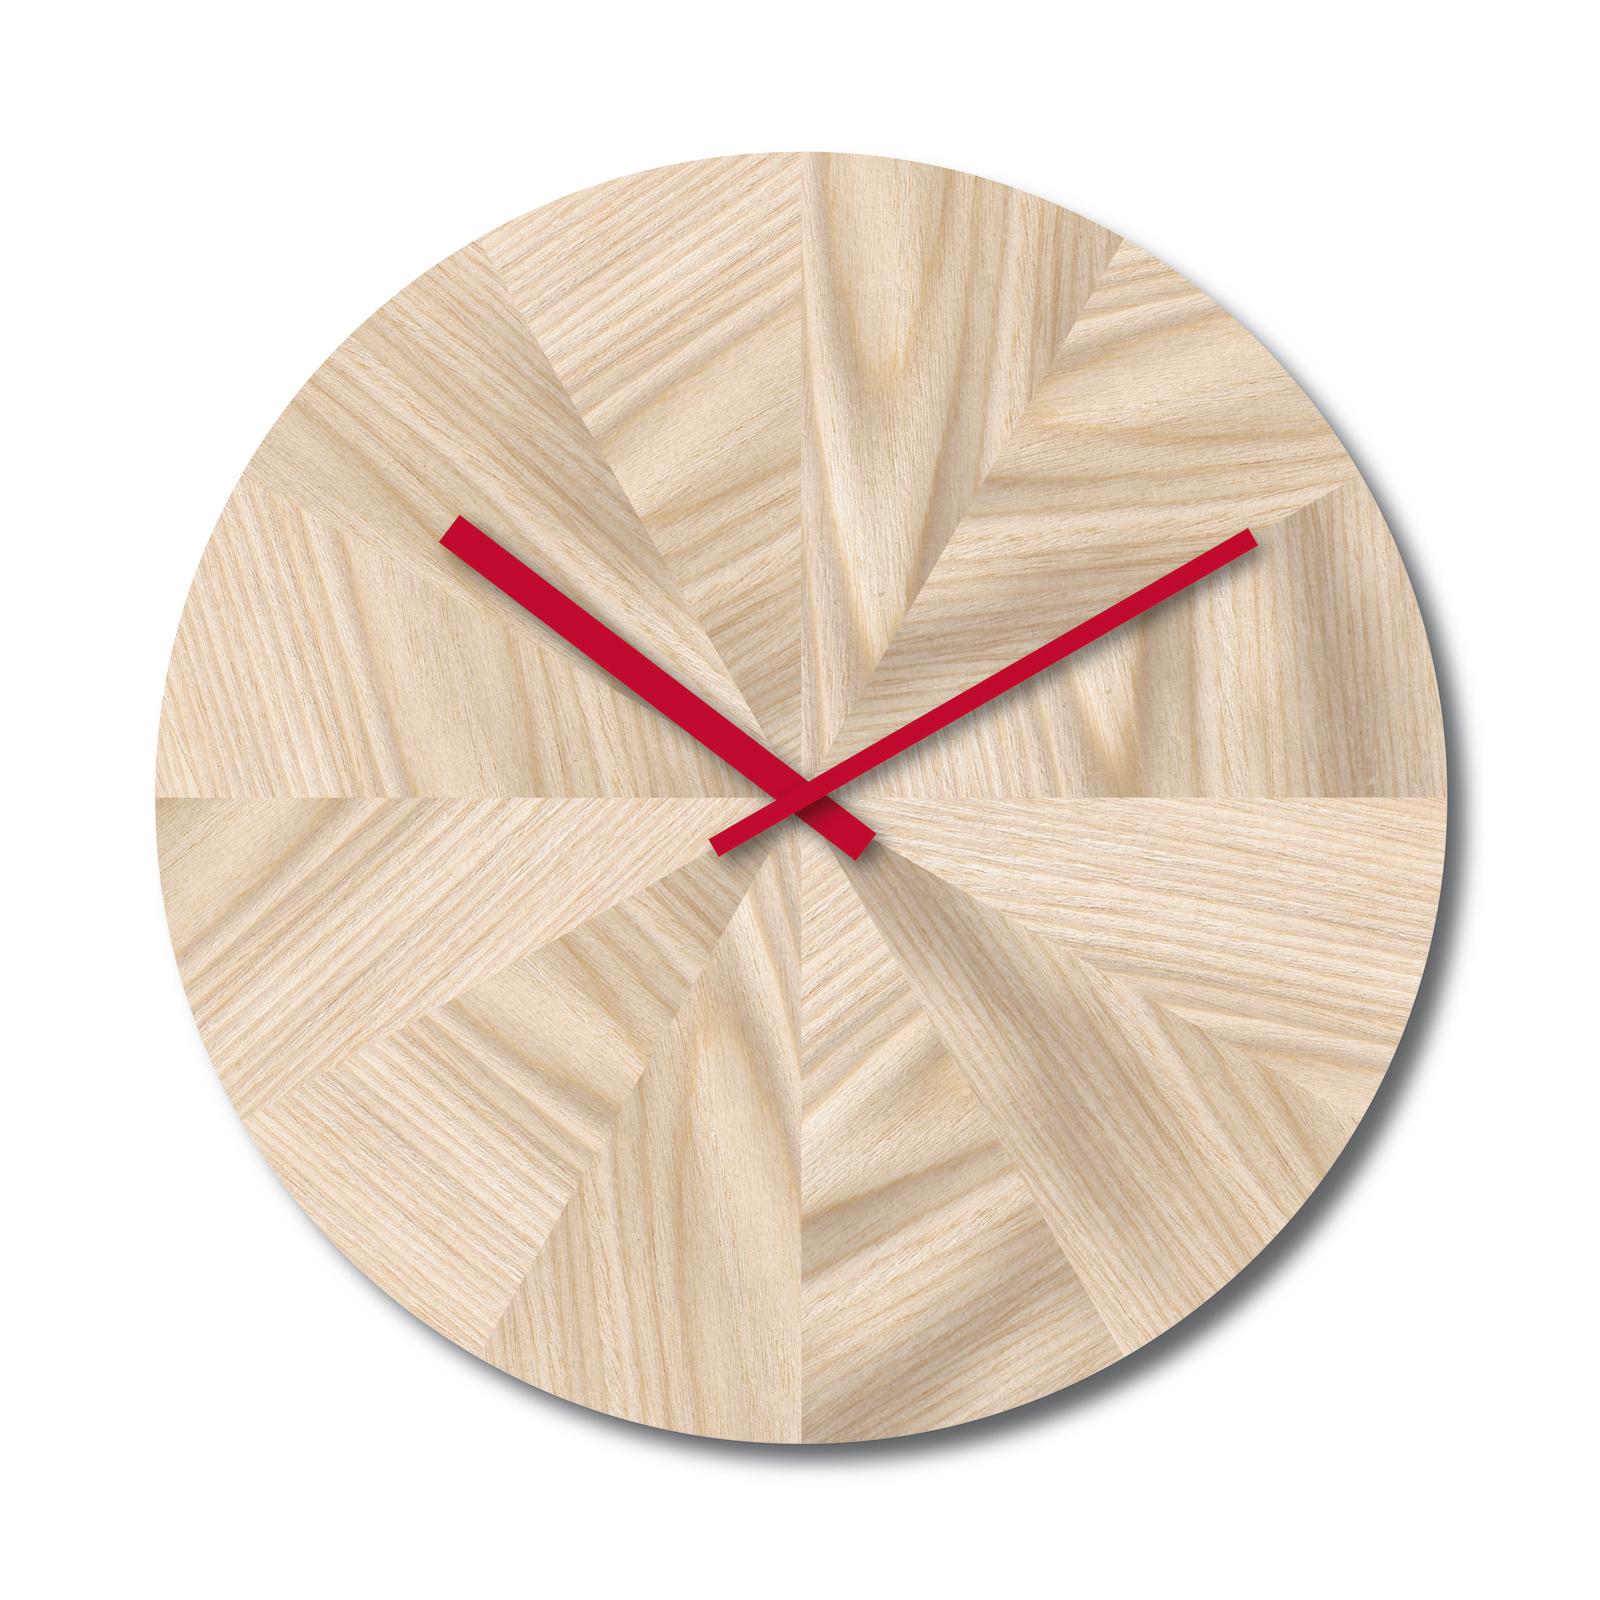 "Clock by <a href=""http://www.ding3000.com/en.html"">Ding3000</a> for Discipline."